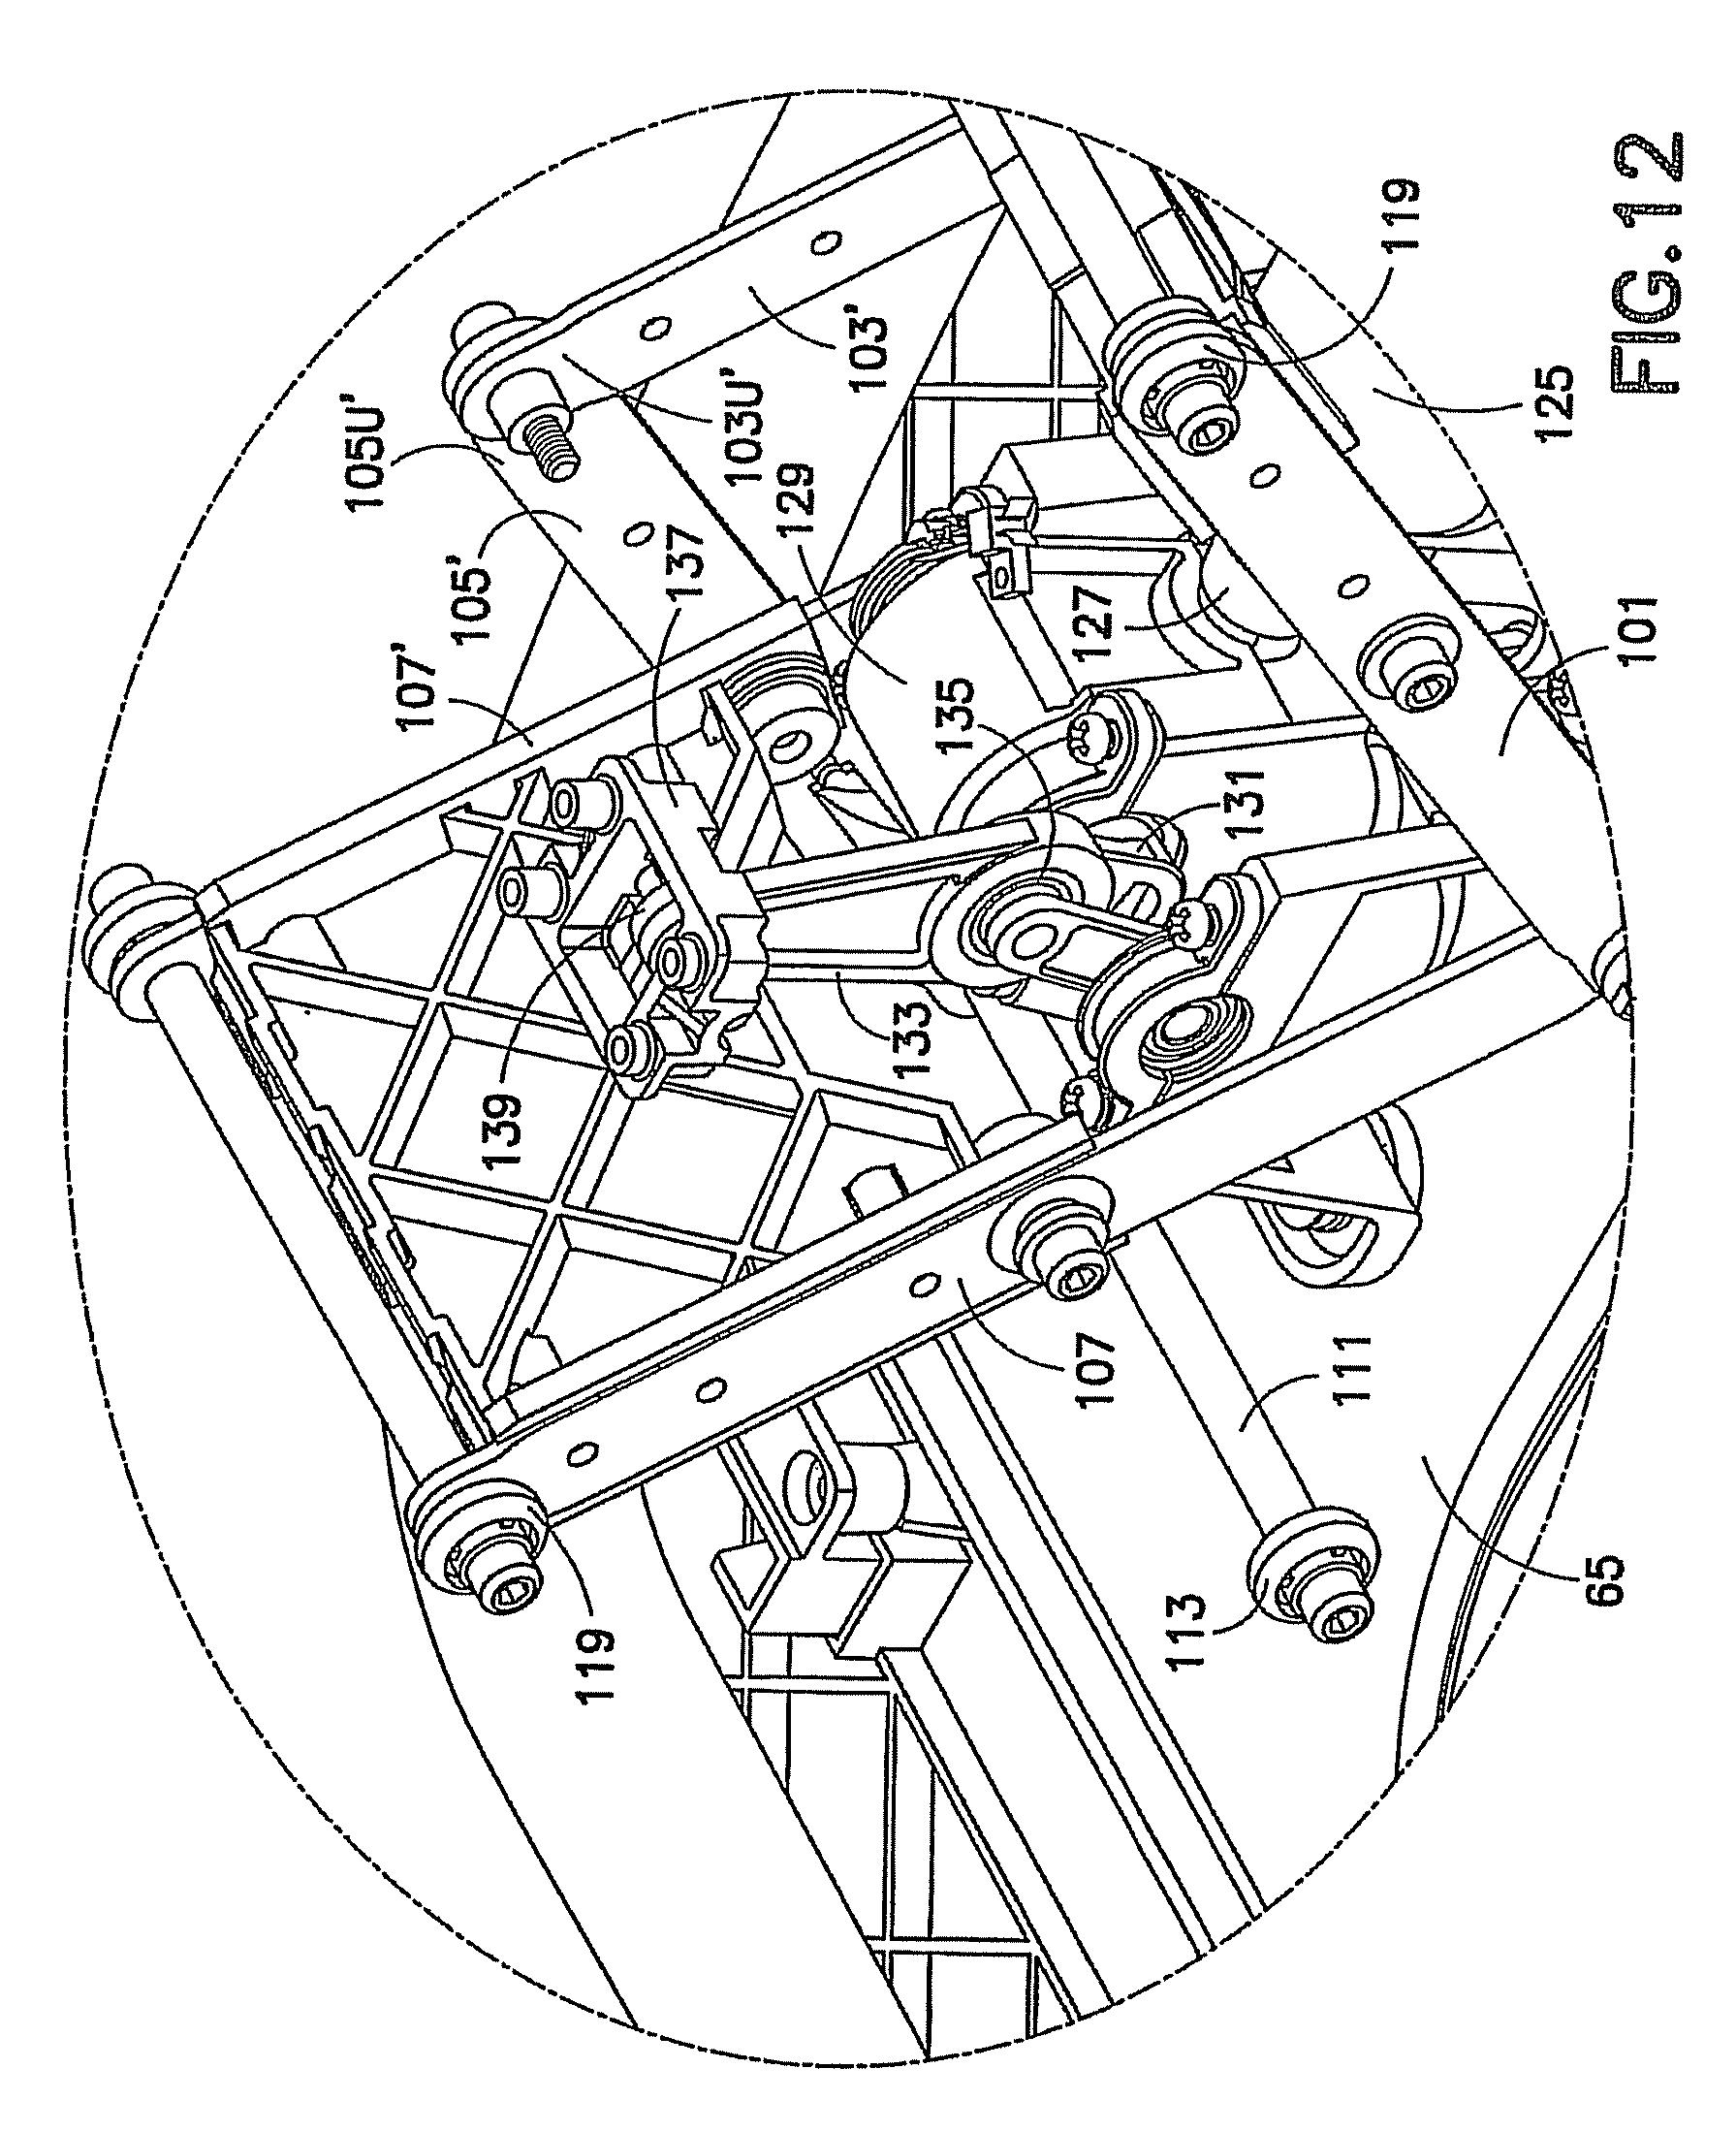 ... Patent US8197005 - Infant care apparatus - Google Patents on fender amp wiring diagram, squier